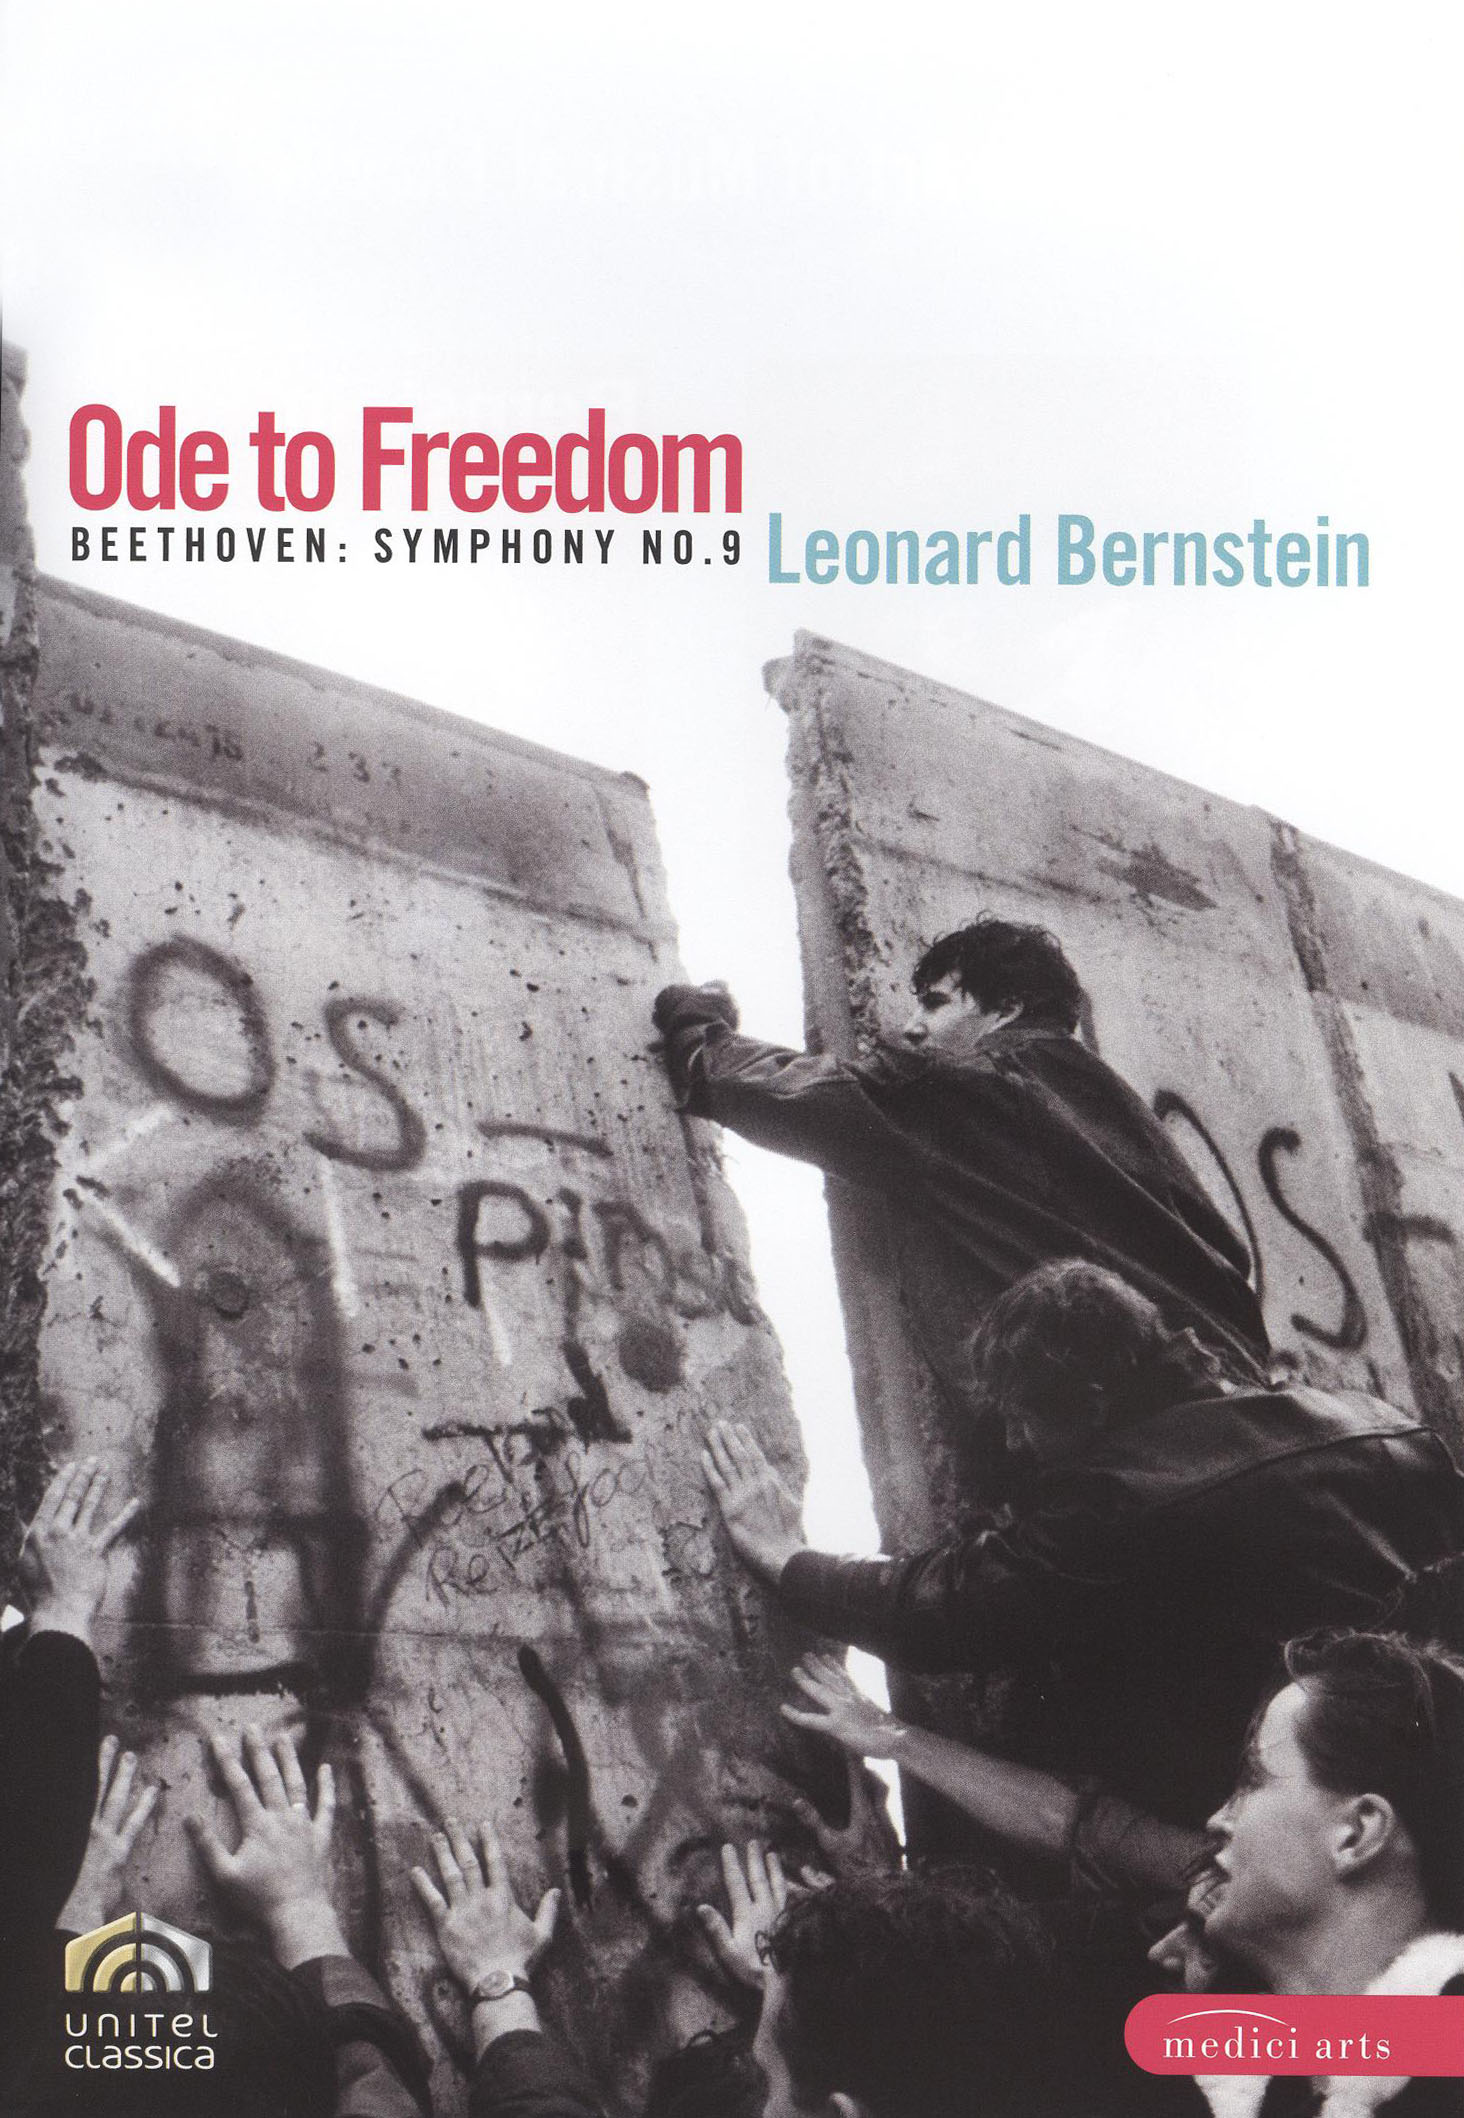 Leonard Bernstein: Ode to Freedom - Beethoven Symphony No. 9